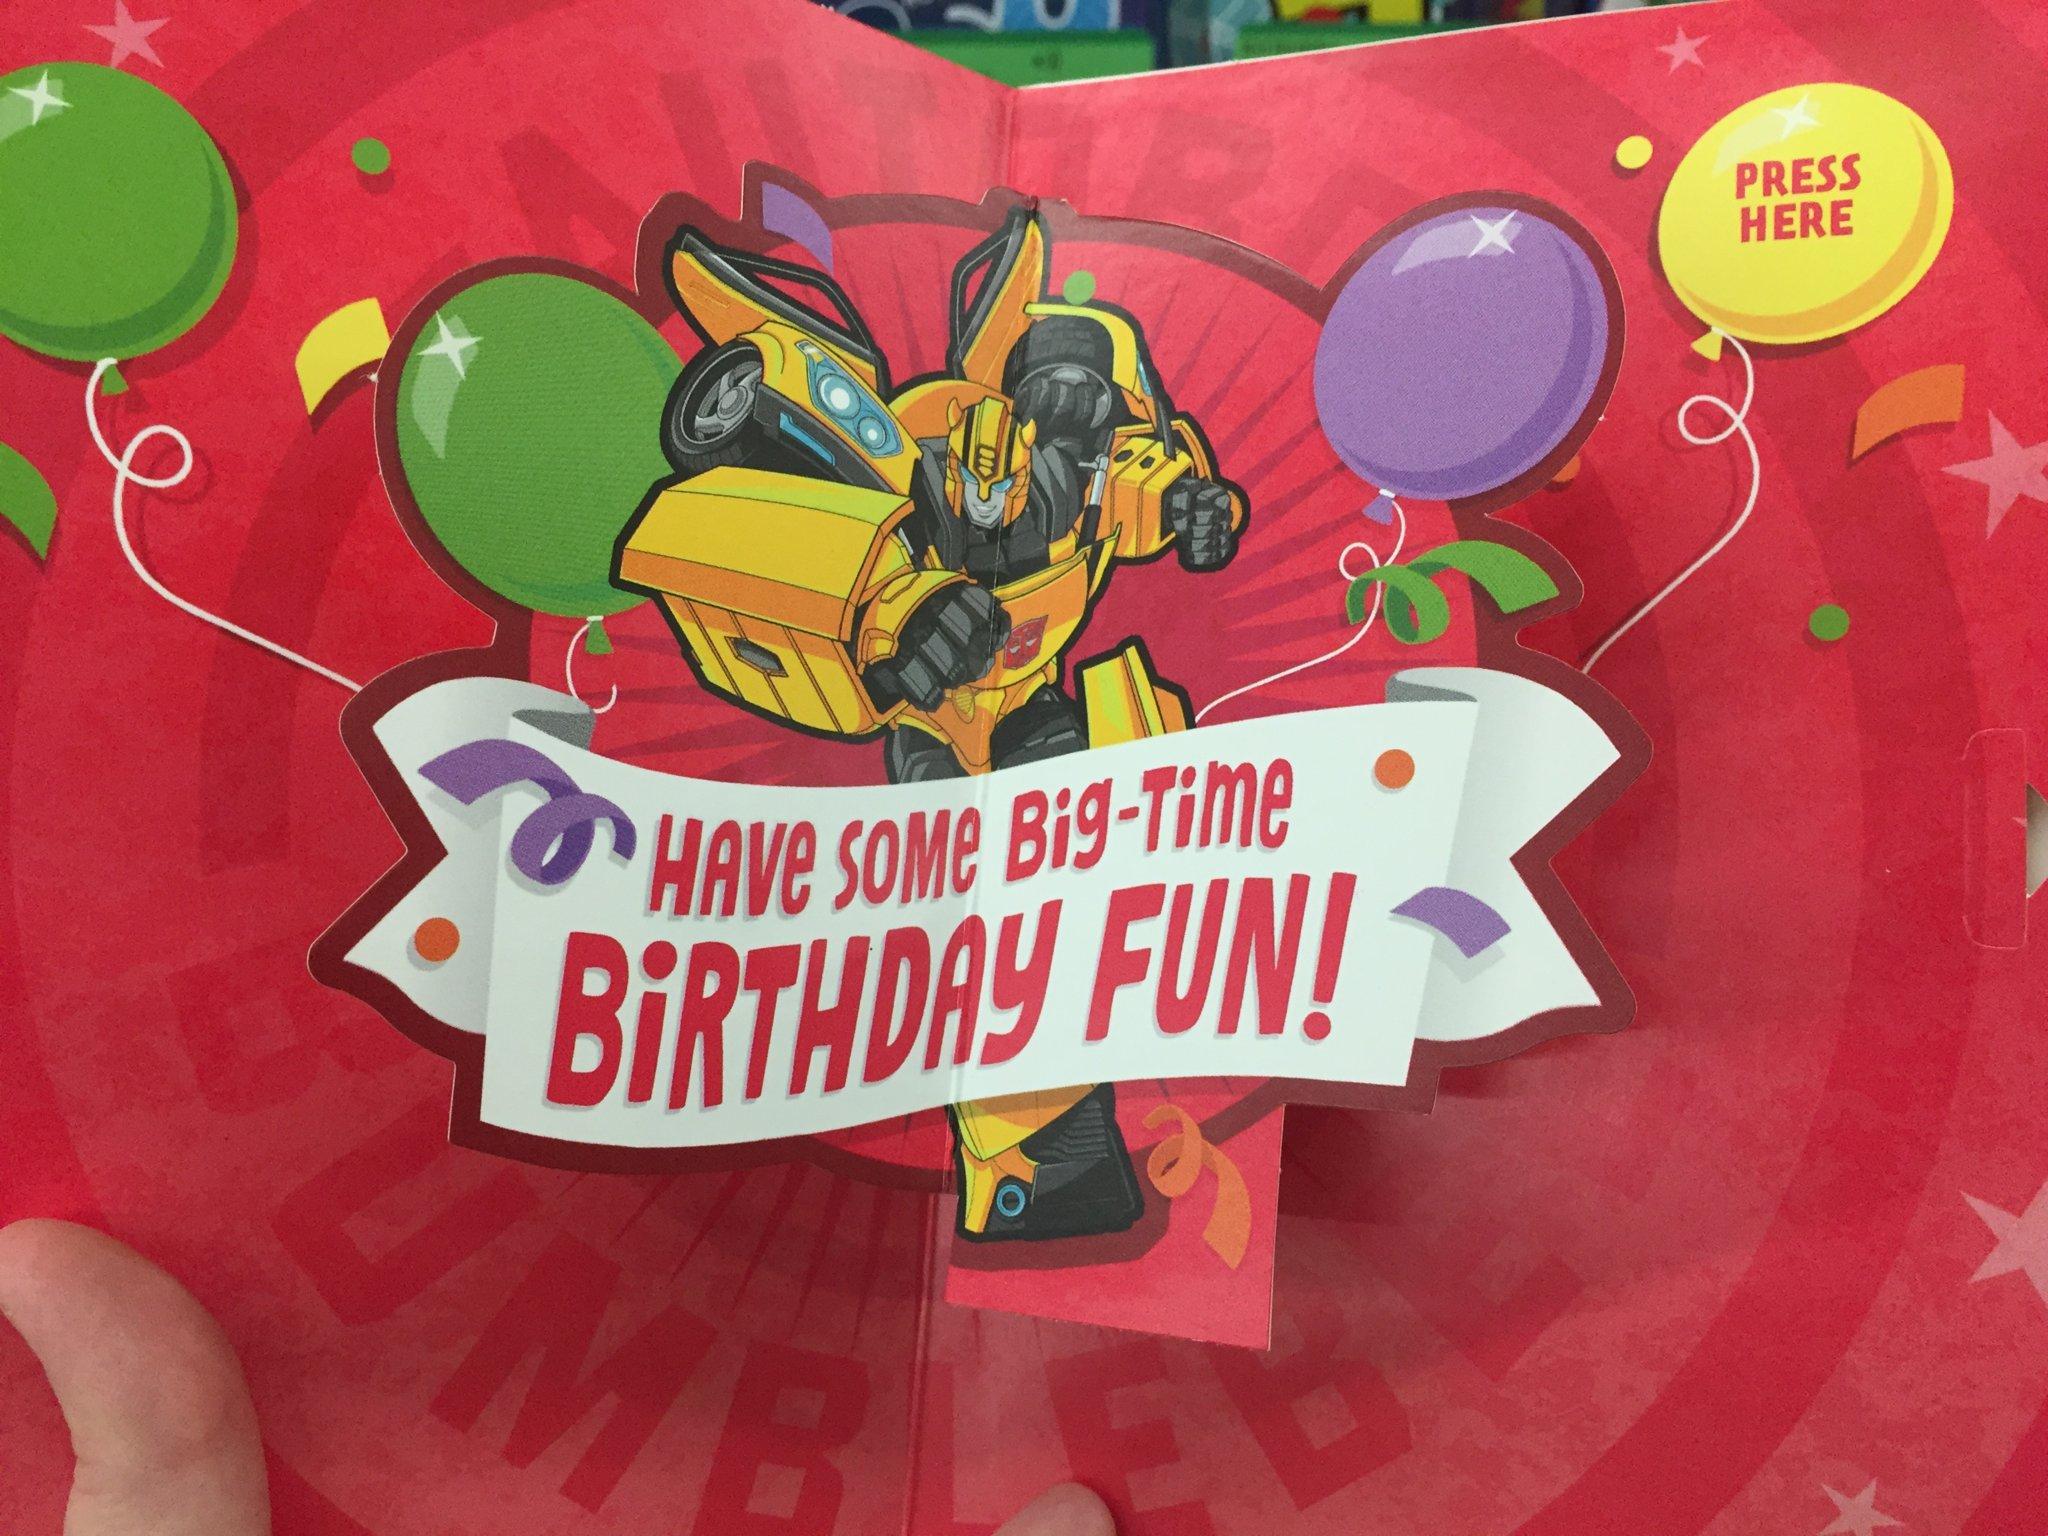 Transformers Birthday Card With Evergreen Designs Found At Walmart